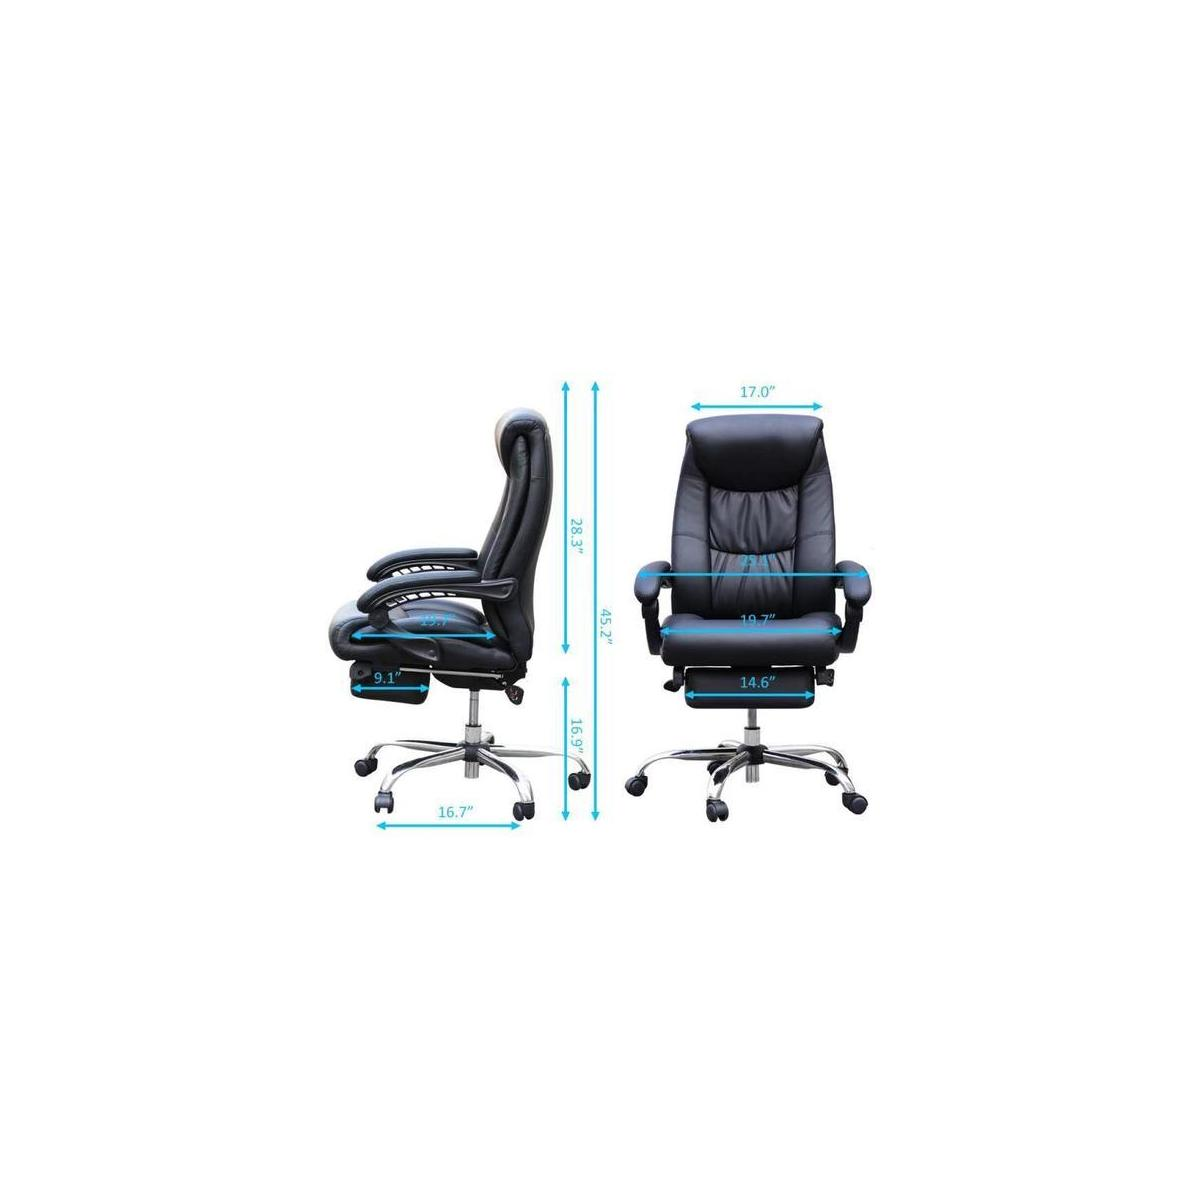 Duramont Reclining Office Chair With Lumbar Support High Back Executive Chair Cashback Rebate Rebatekey